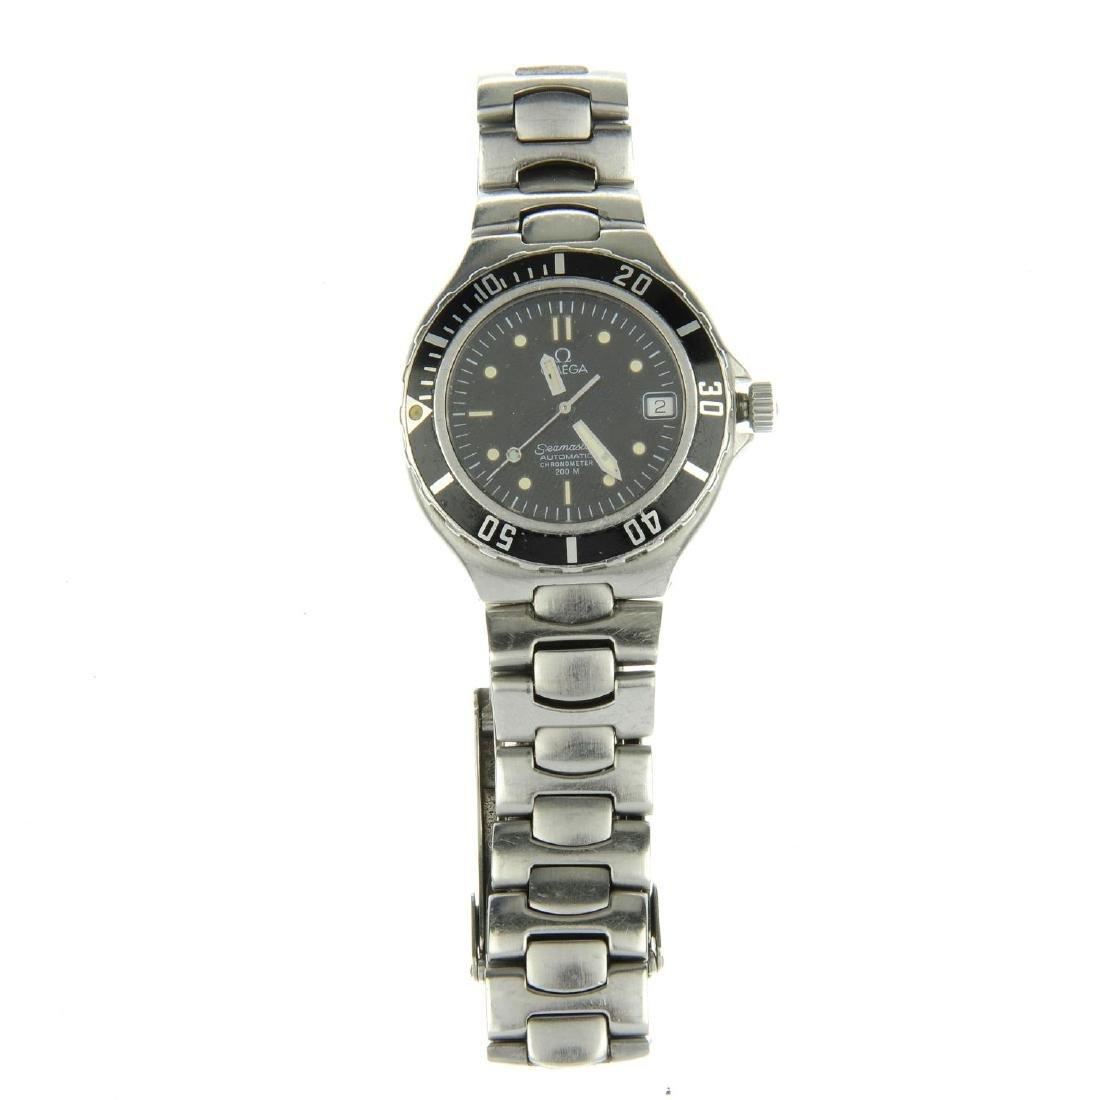 OMEGA - a gentleman's Seamaster 200M bracelet watch.